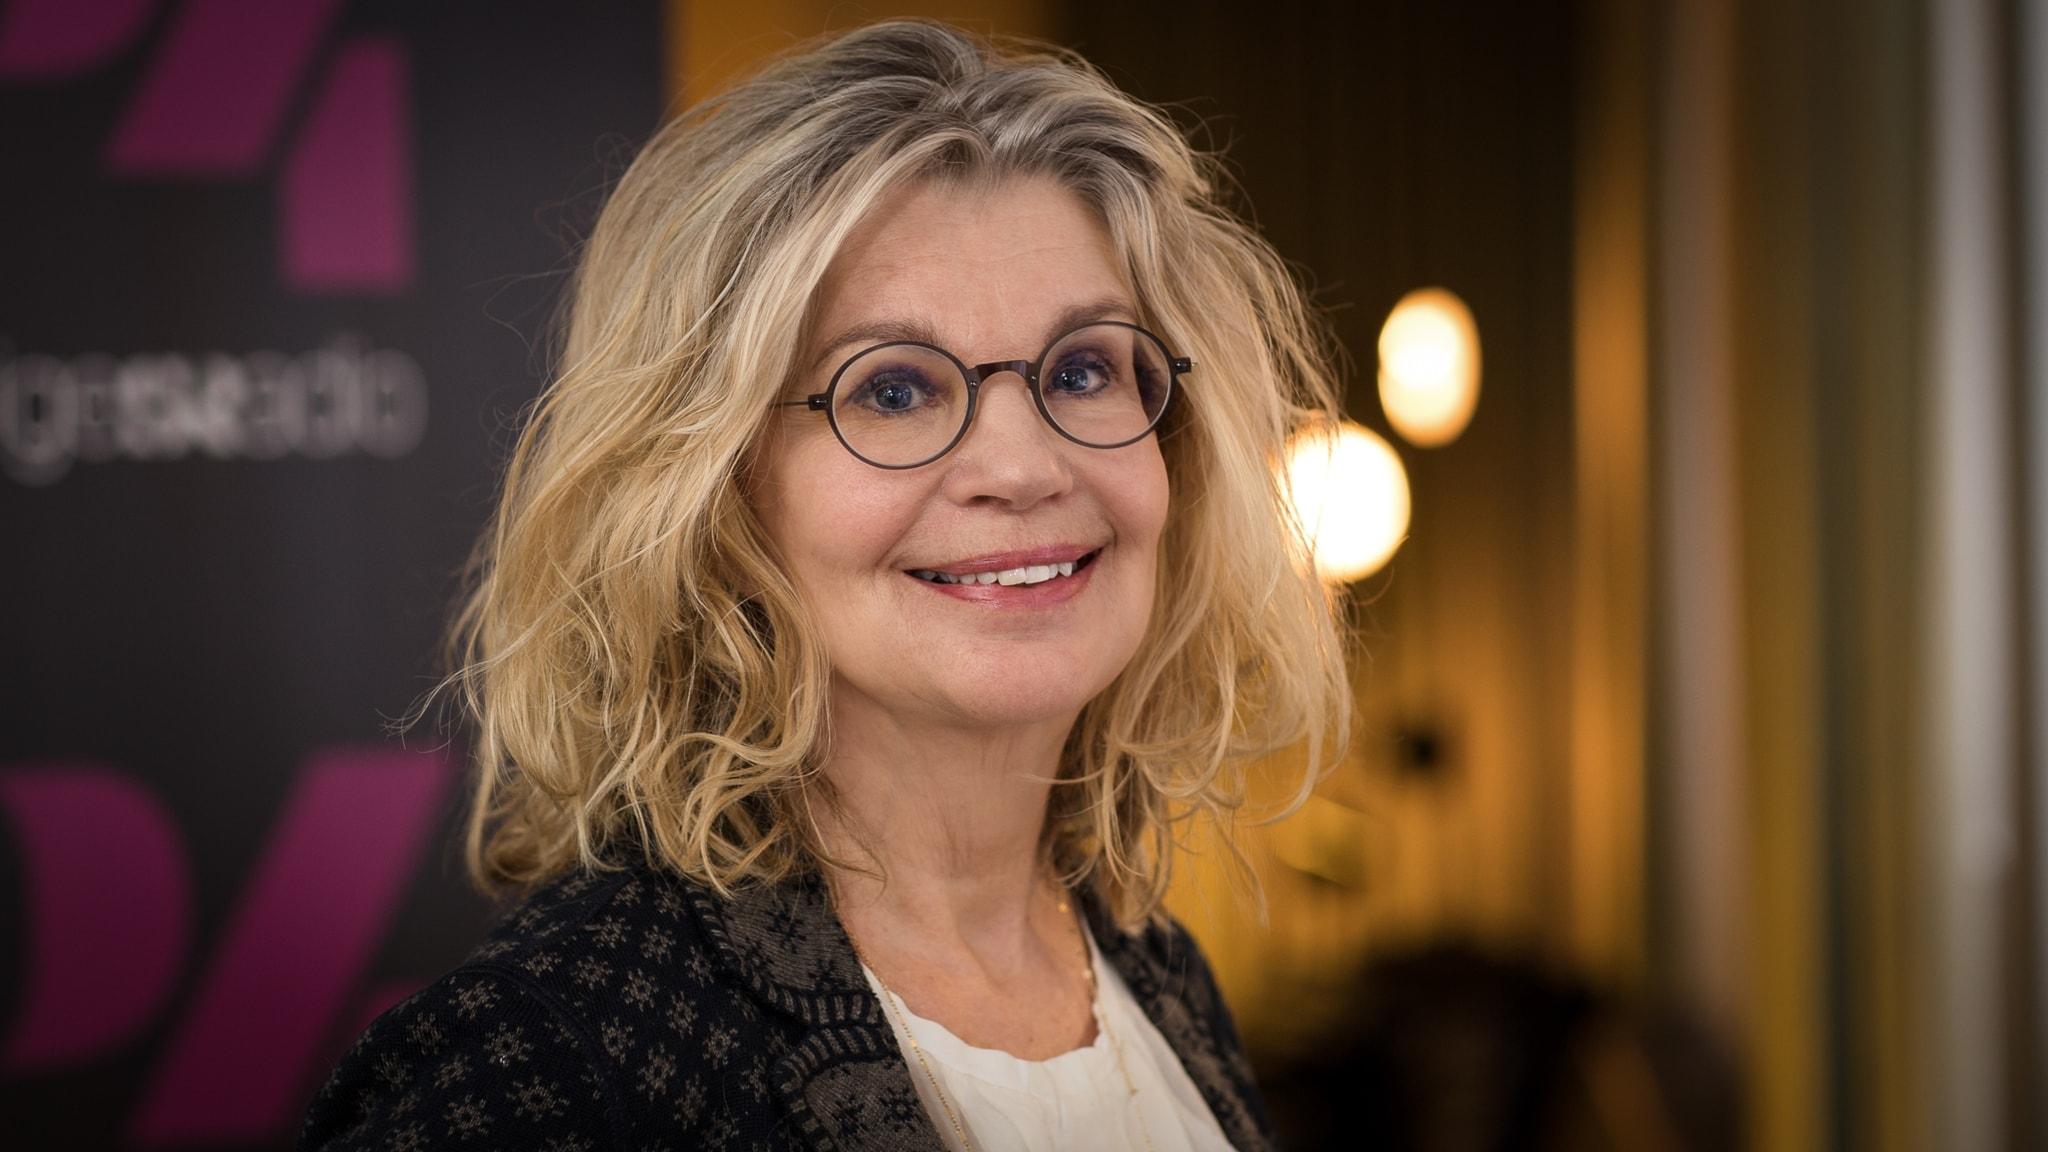 Malena Ivarsson